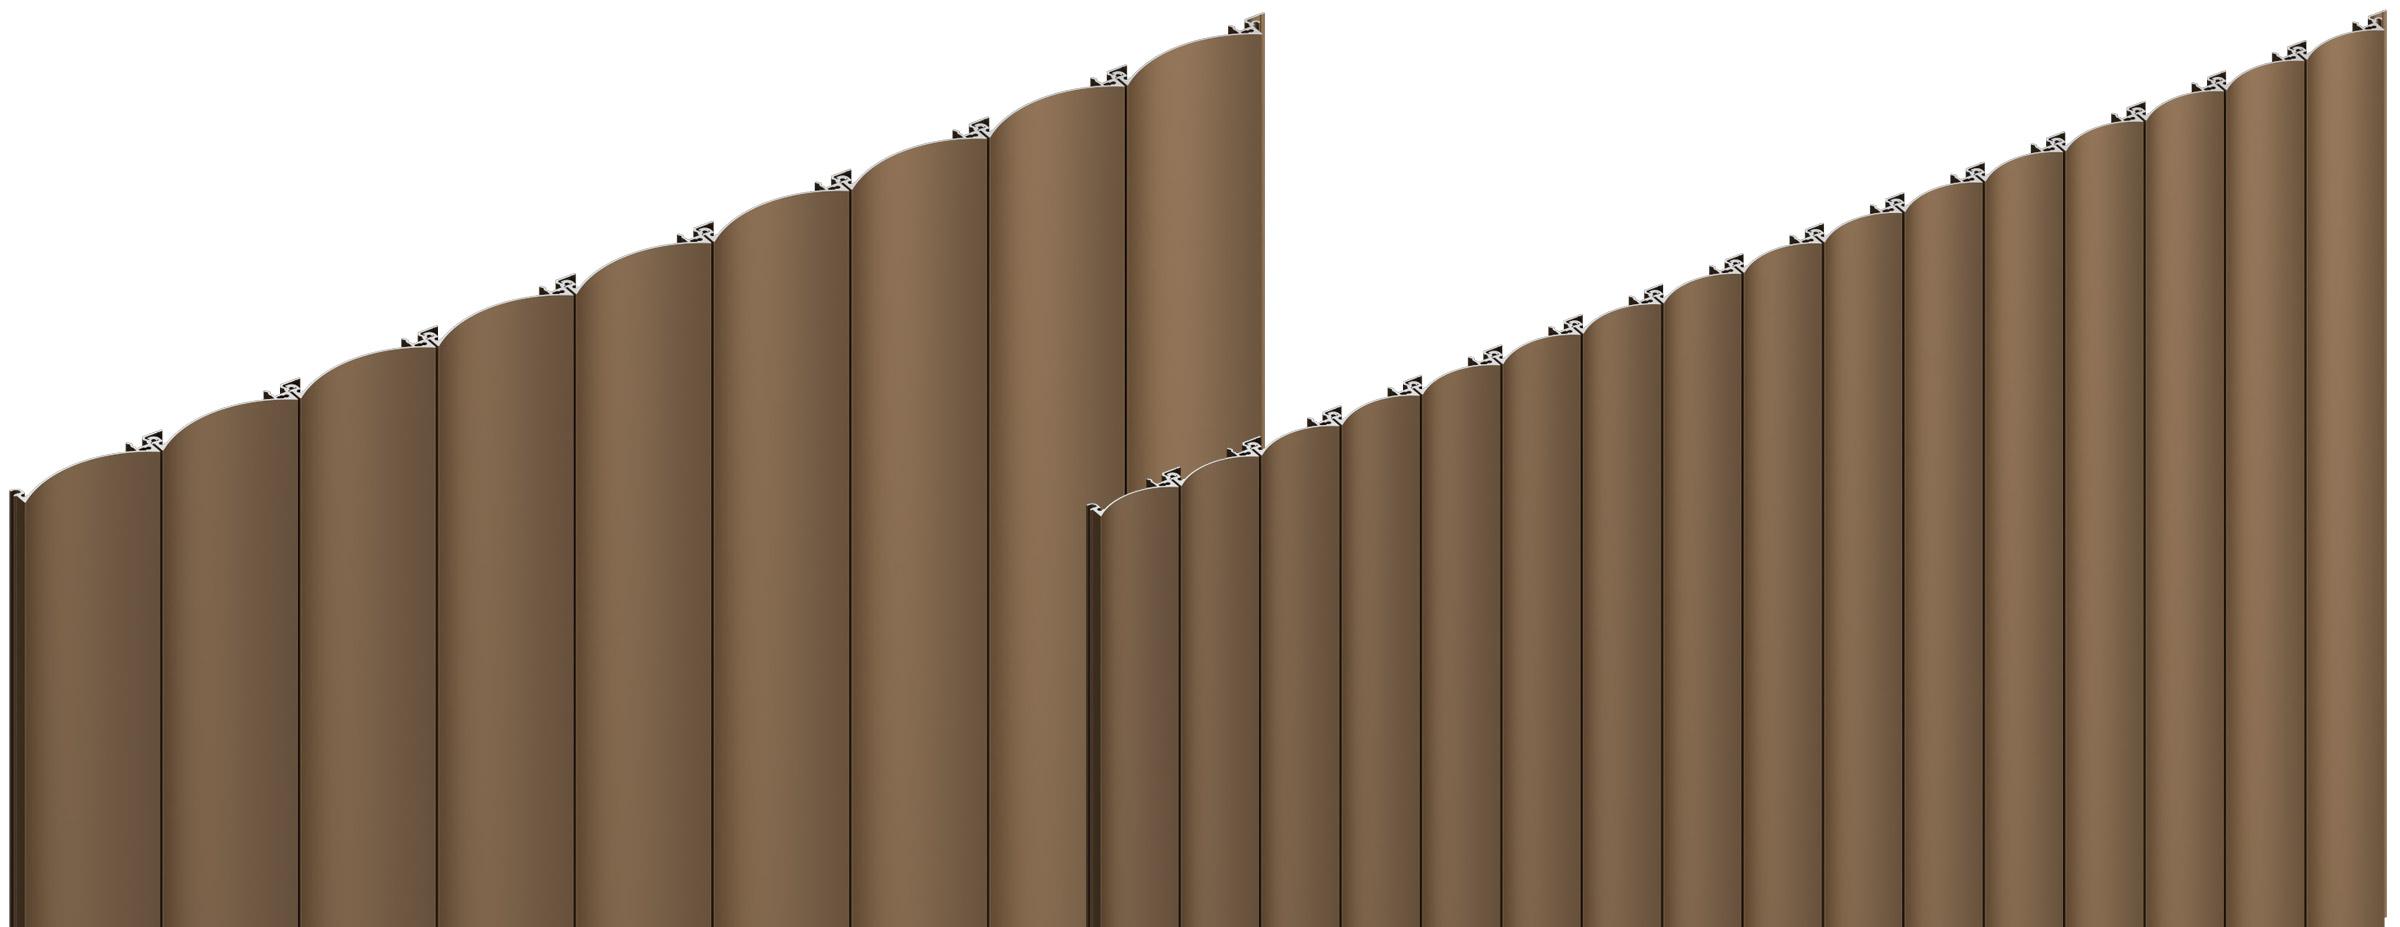 Sculptform Aluminium Click-on Cladding flute profile